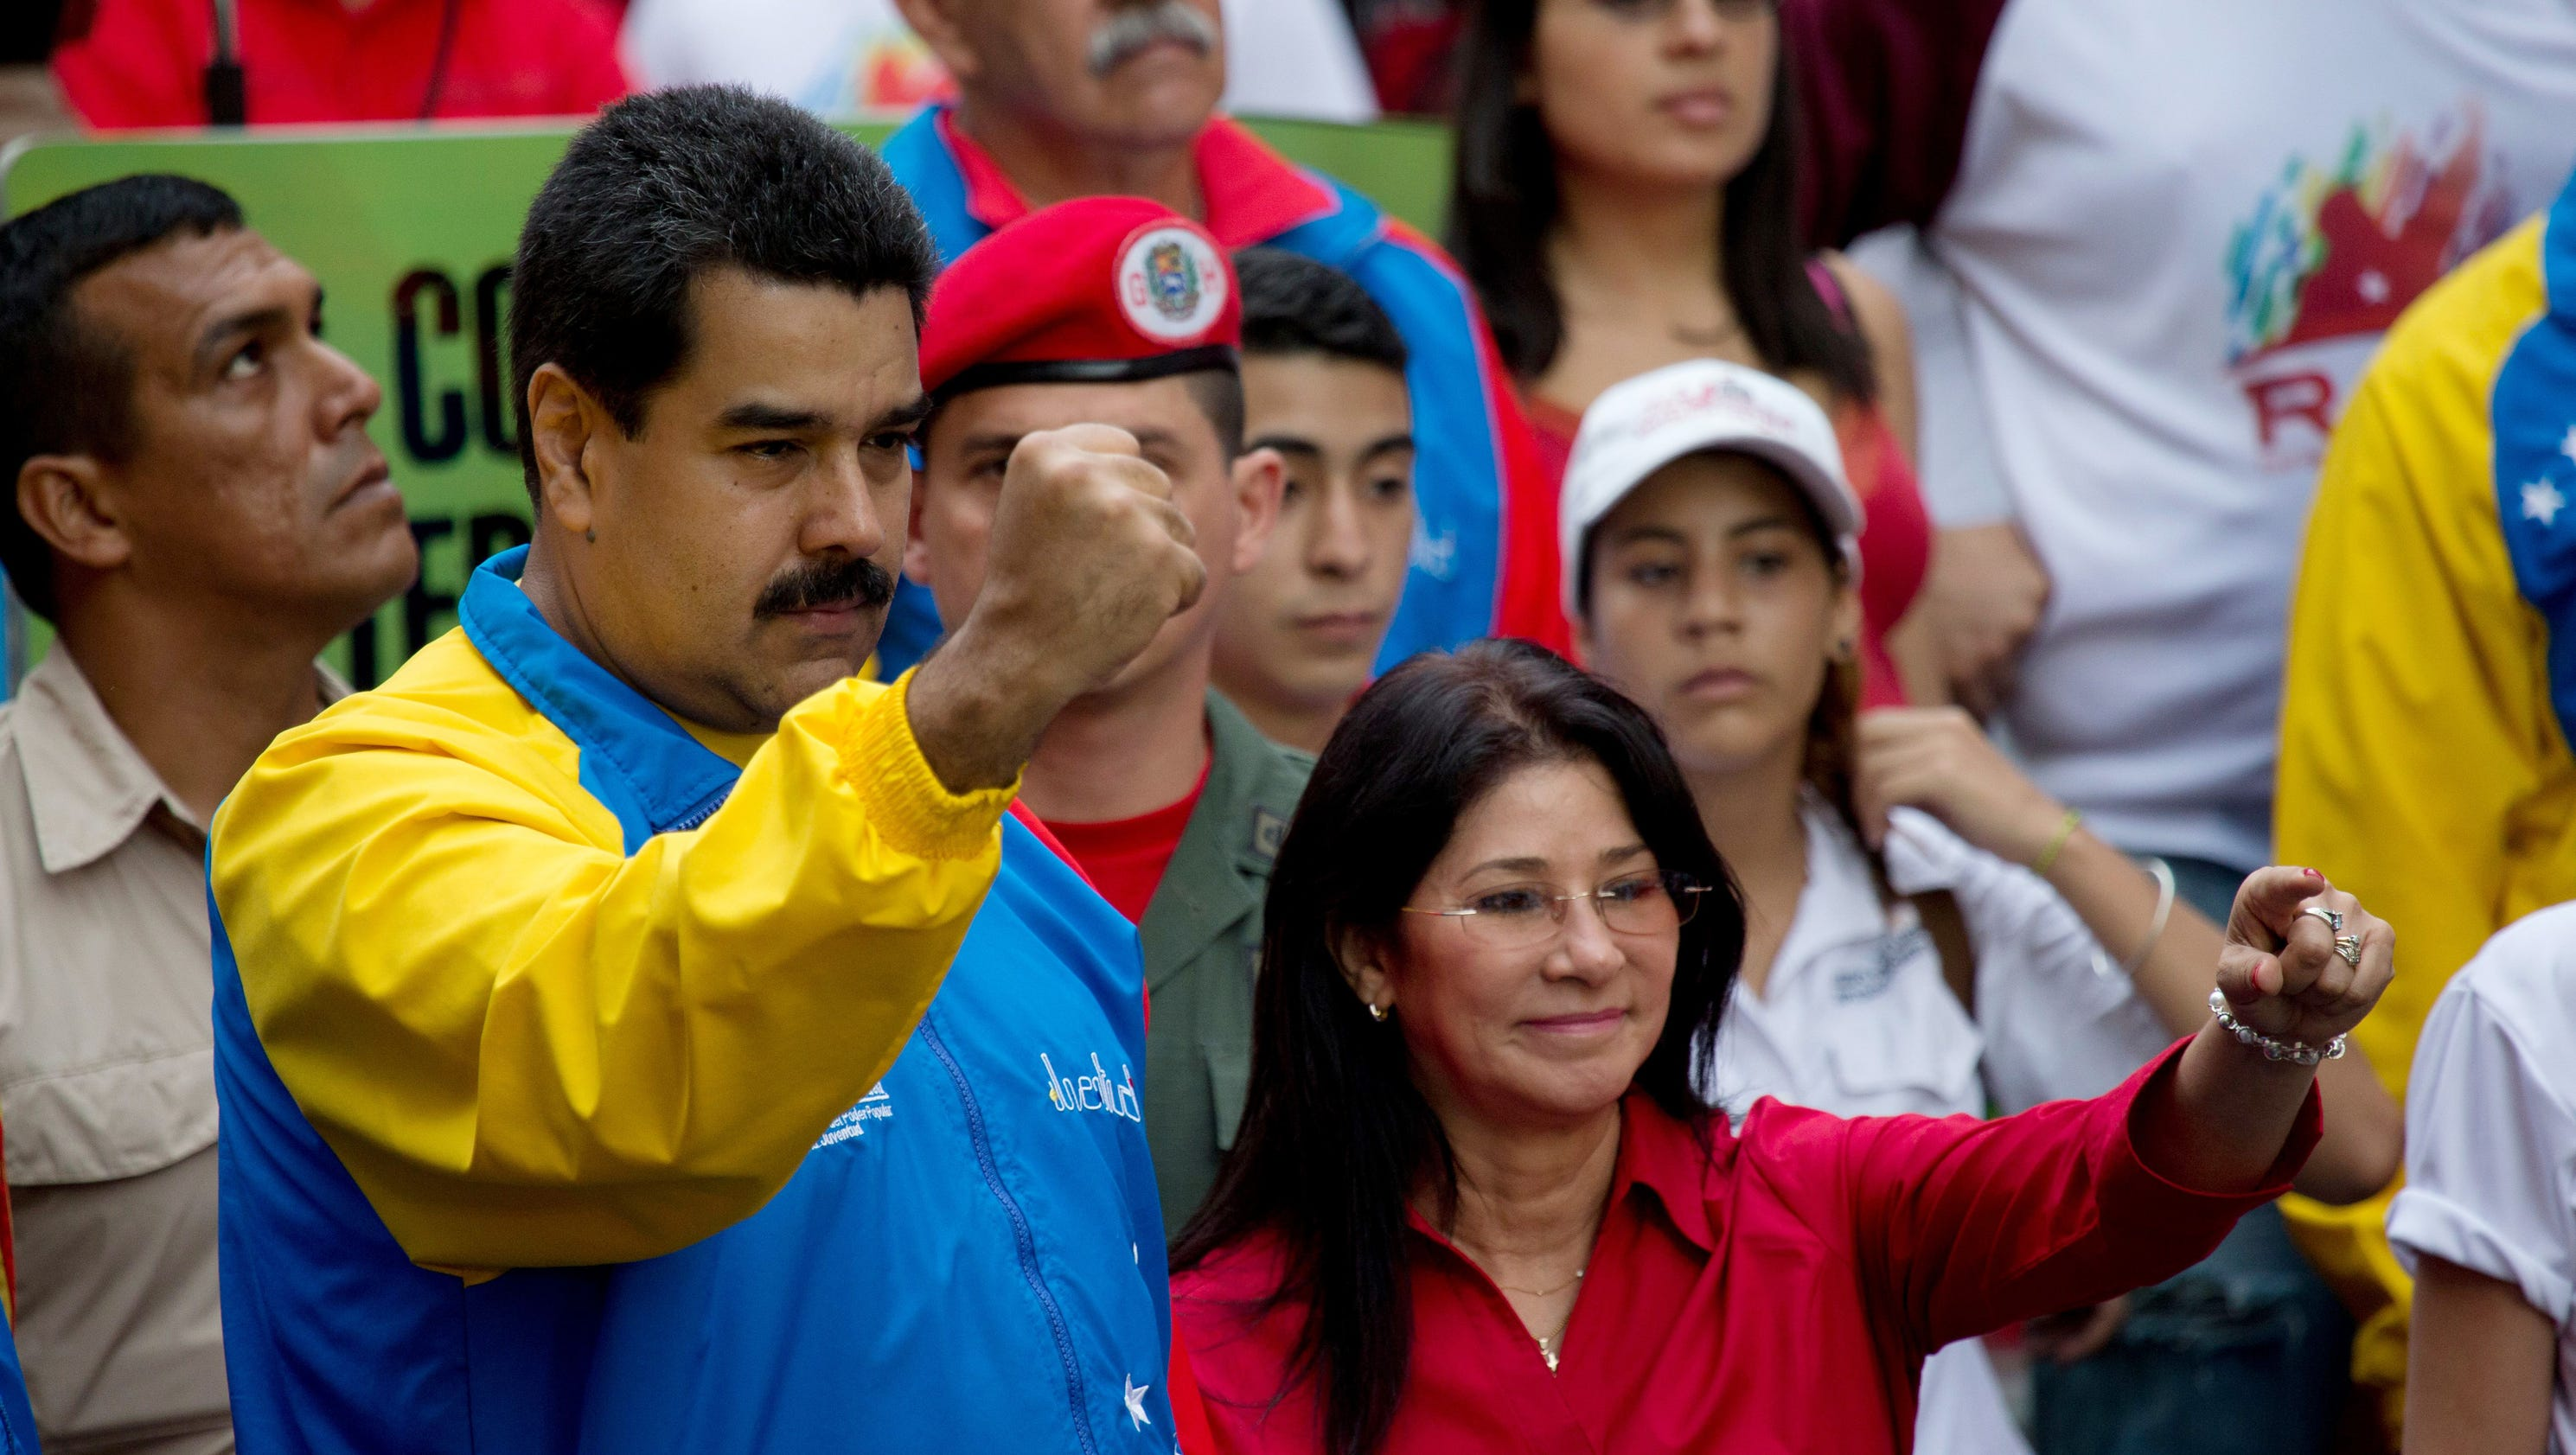 2 nephews of Venezuelan first lady indicted on U.S. drug ...